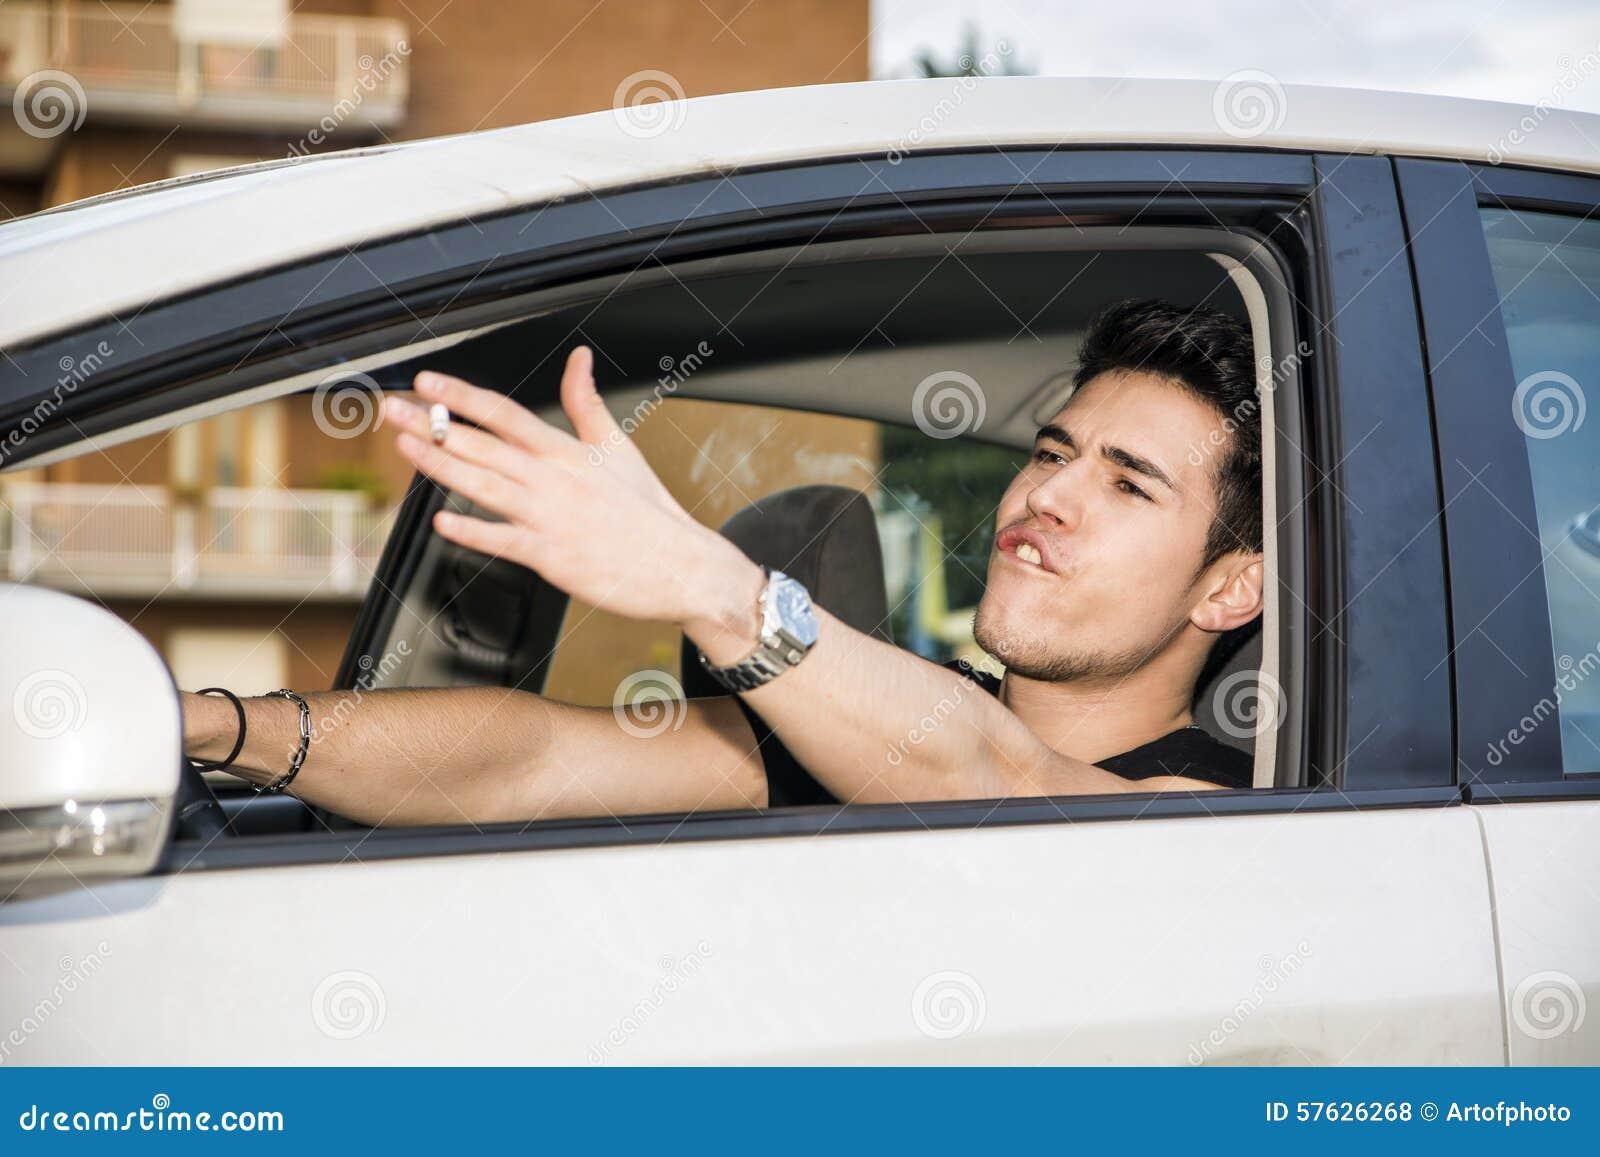 Woman Driving Car Screaming